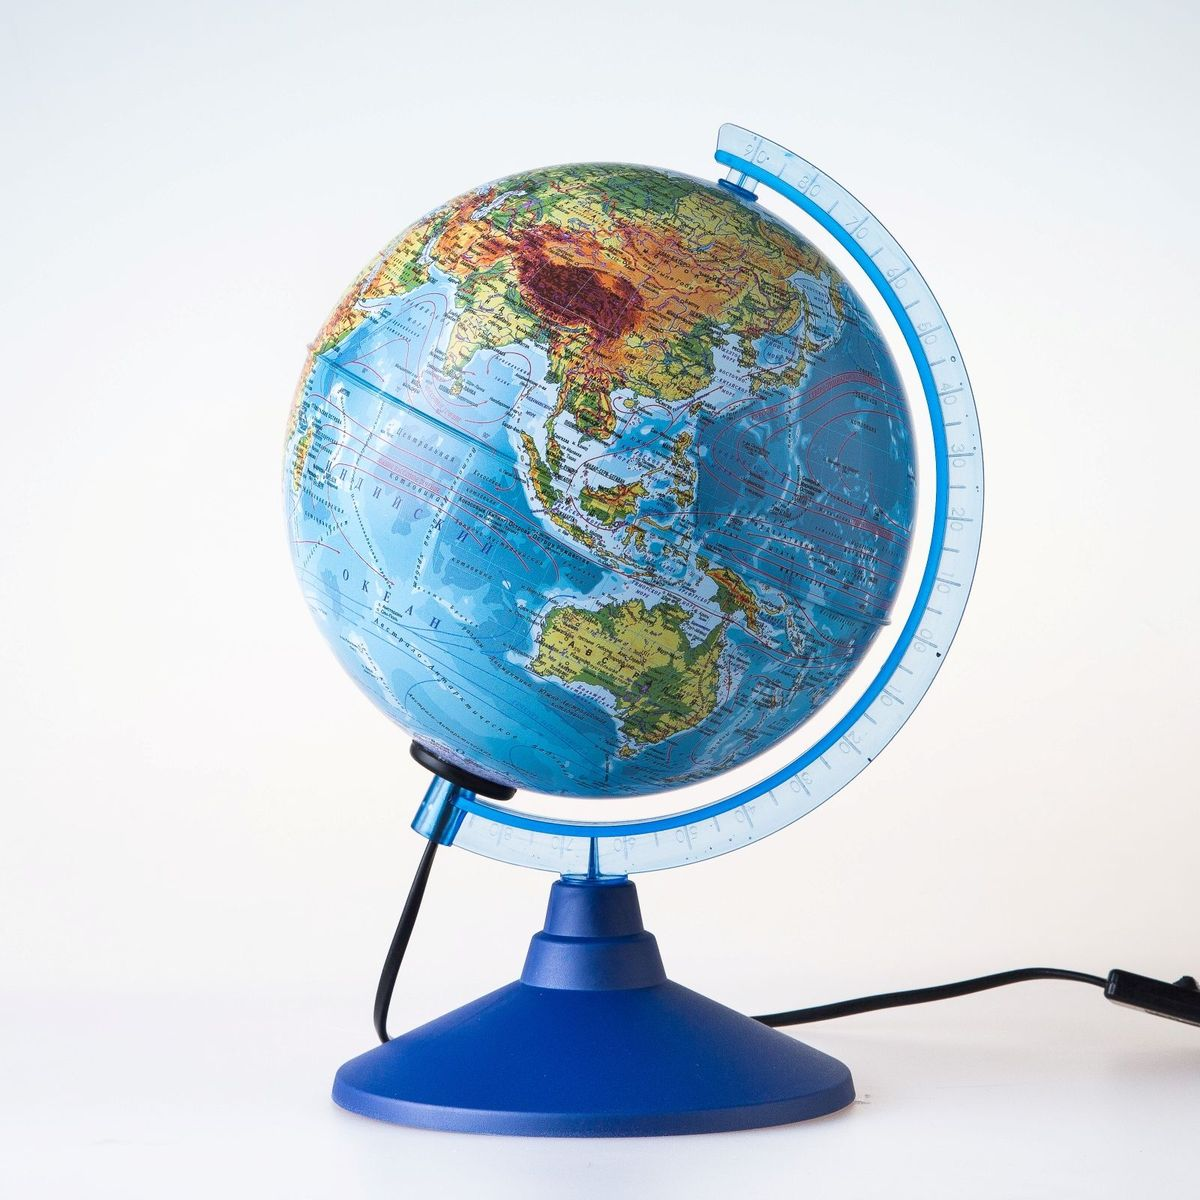 Глобен Глобус физический Классик Евро диаметр 15 см